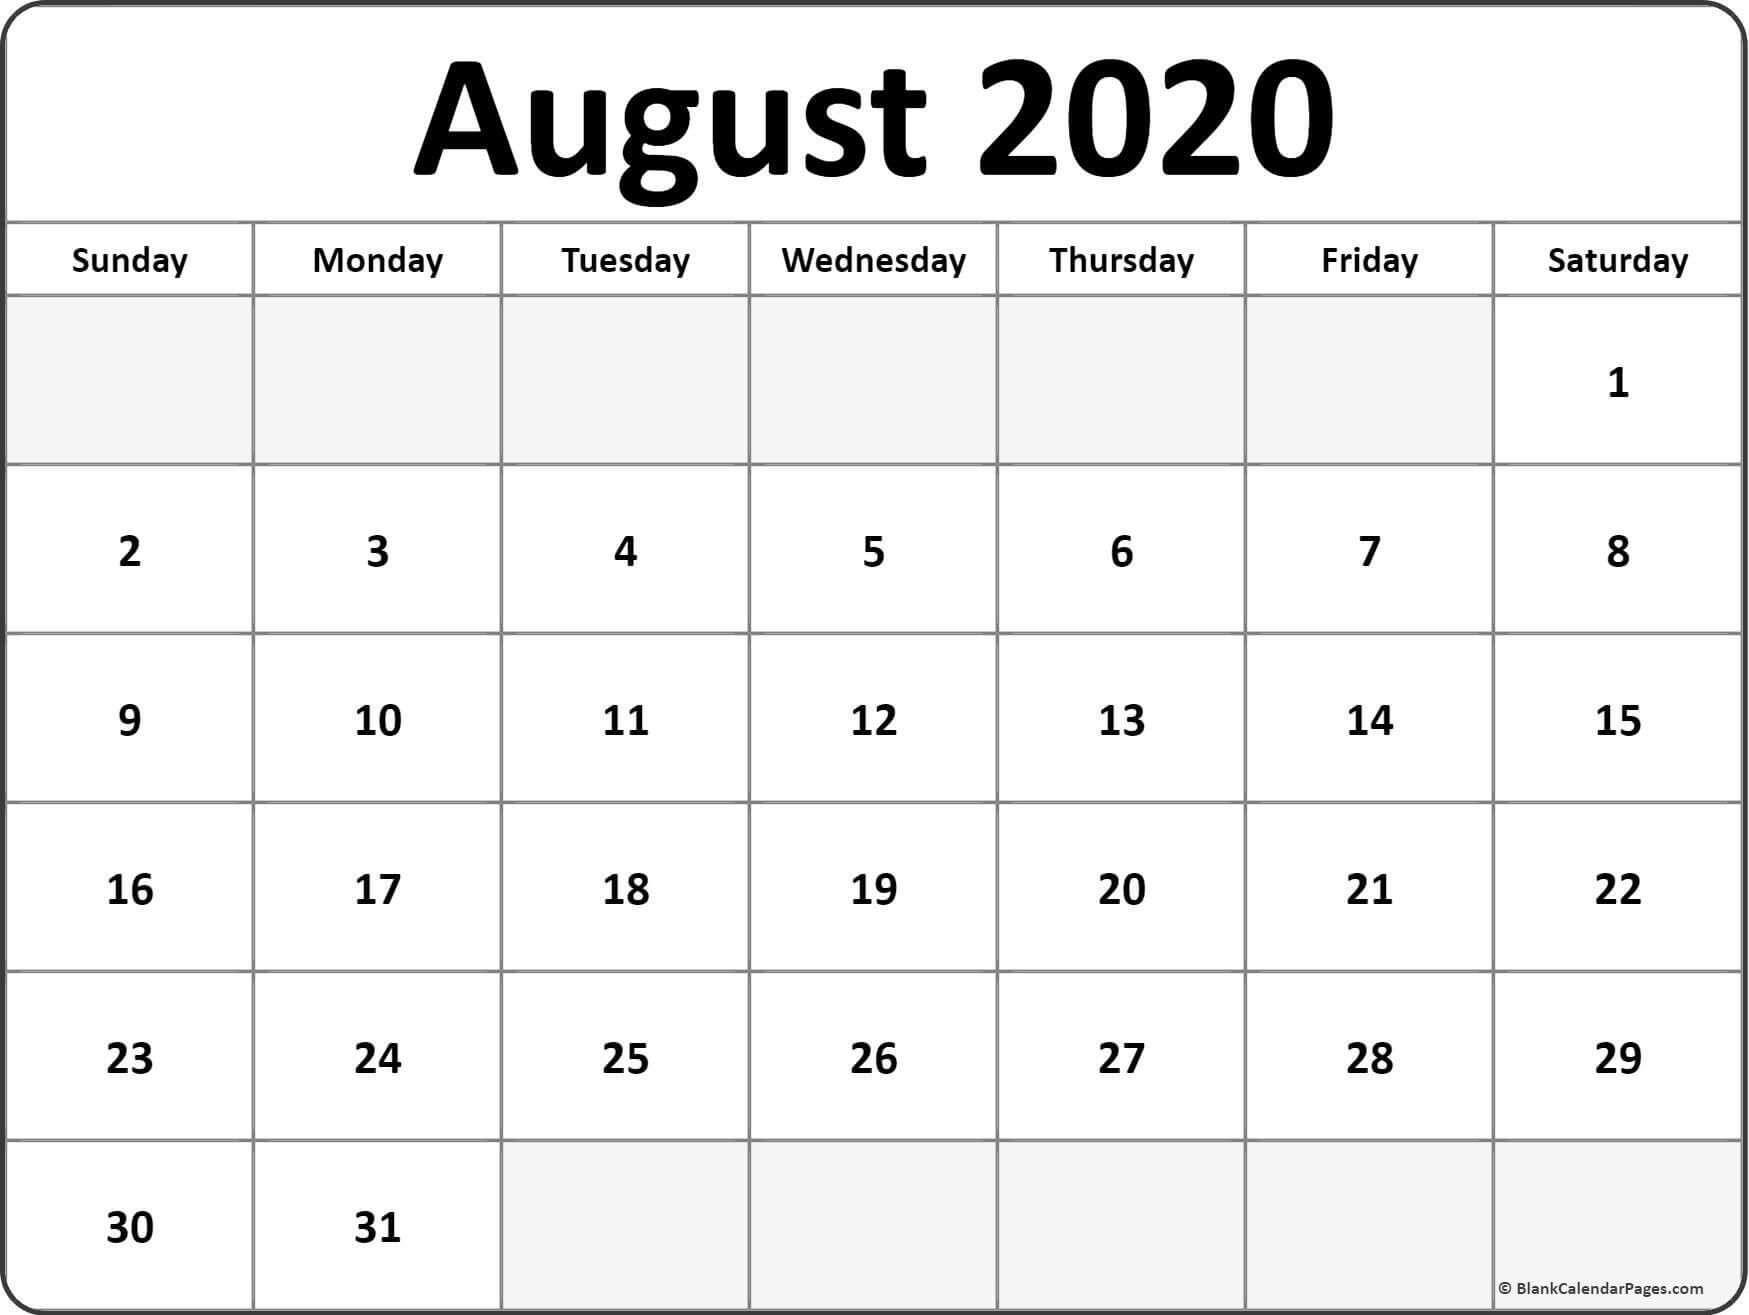 August Calendar 2020 Printable Pdf In 2020 | August Calendar